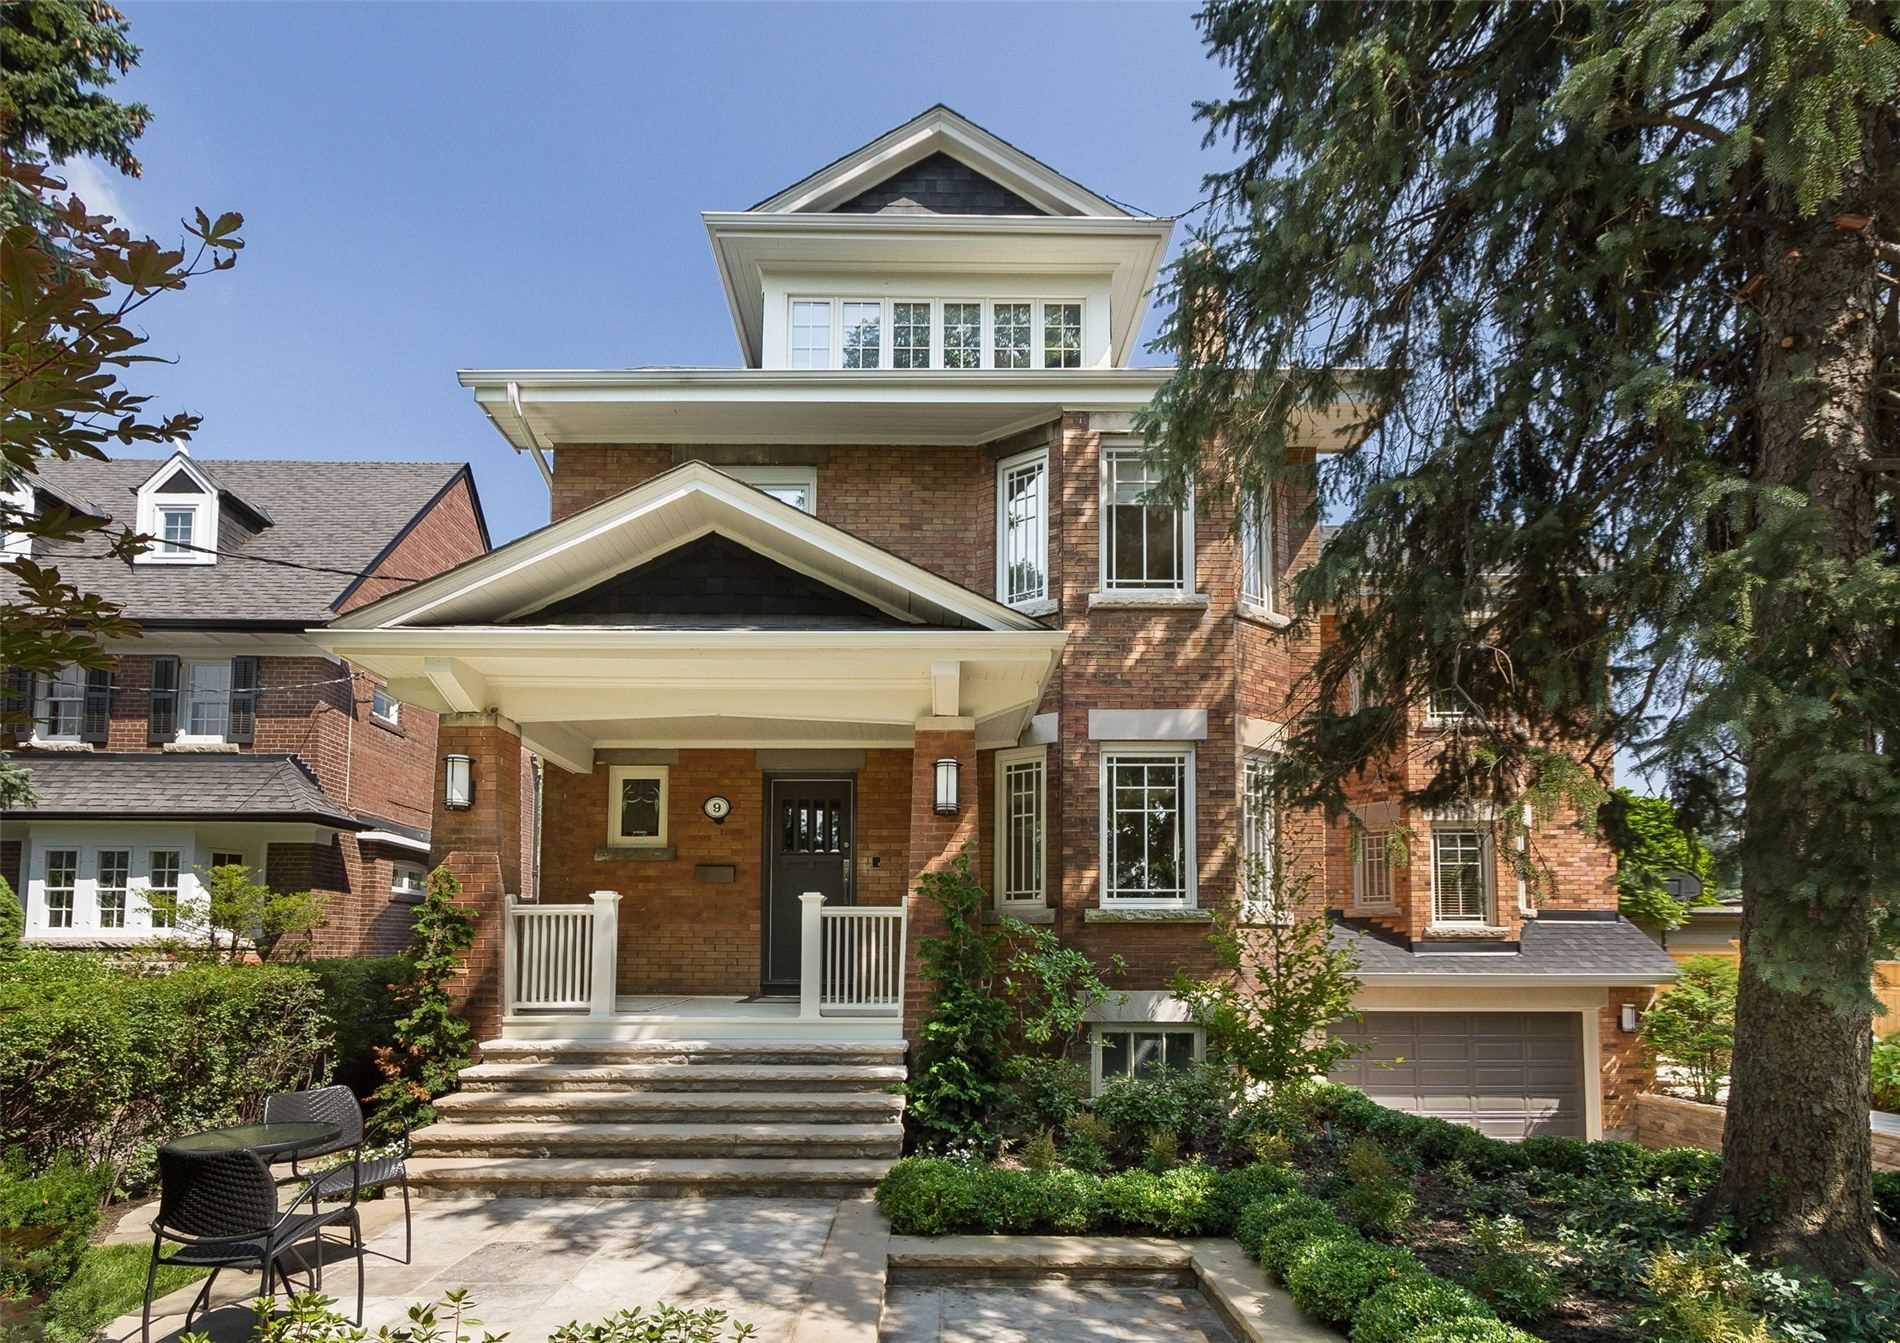 9 Weybourne Cres, Toronto, Ontario M4N2R2, 6 Bedrooms Bedrooms, 13 Rooms Rooms,5 BathroomsBathrooms,Detached,For Sale,Weybourne,C4767568